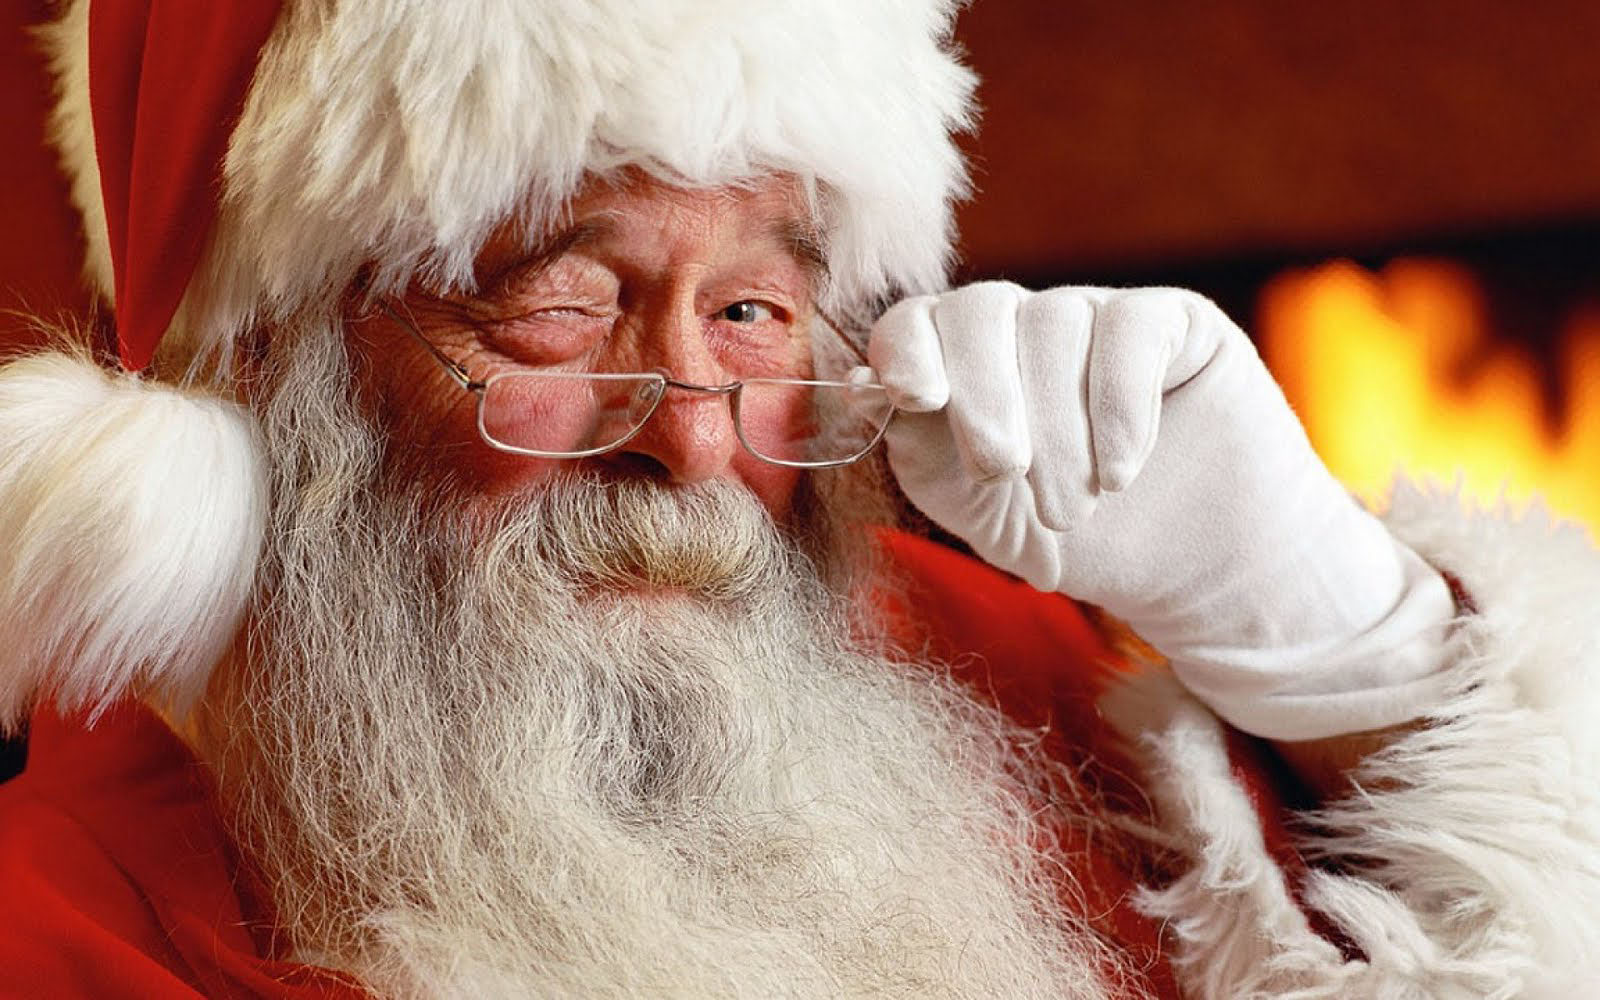 https://2.bp.blogspot.com/-V8vhtwuSw0c/Tq_ShV8HbhI/AAAAAAAAP0o/KPGG4BoOEoM/s1600/Mooie-kerstman-achtergronden-leuke-kerstman-wallpapers-afbeelding-plaatje-foto-1.jpg